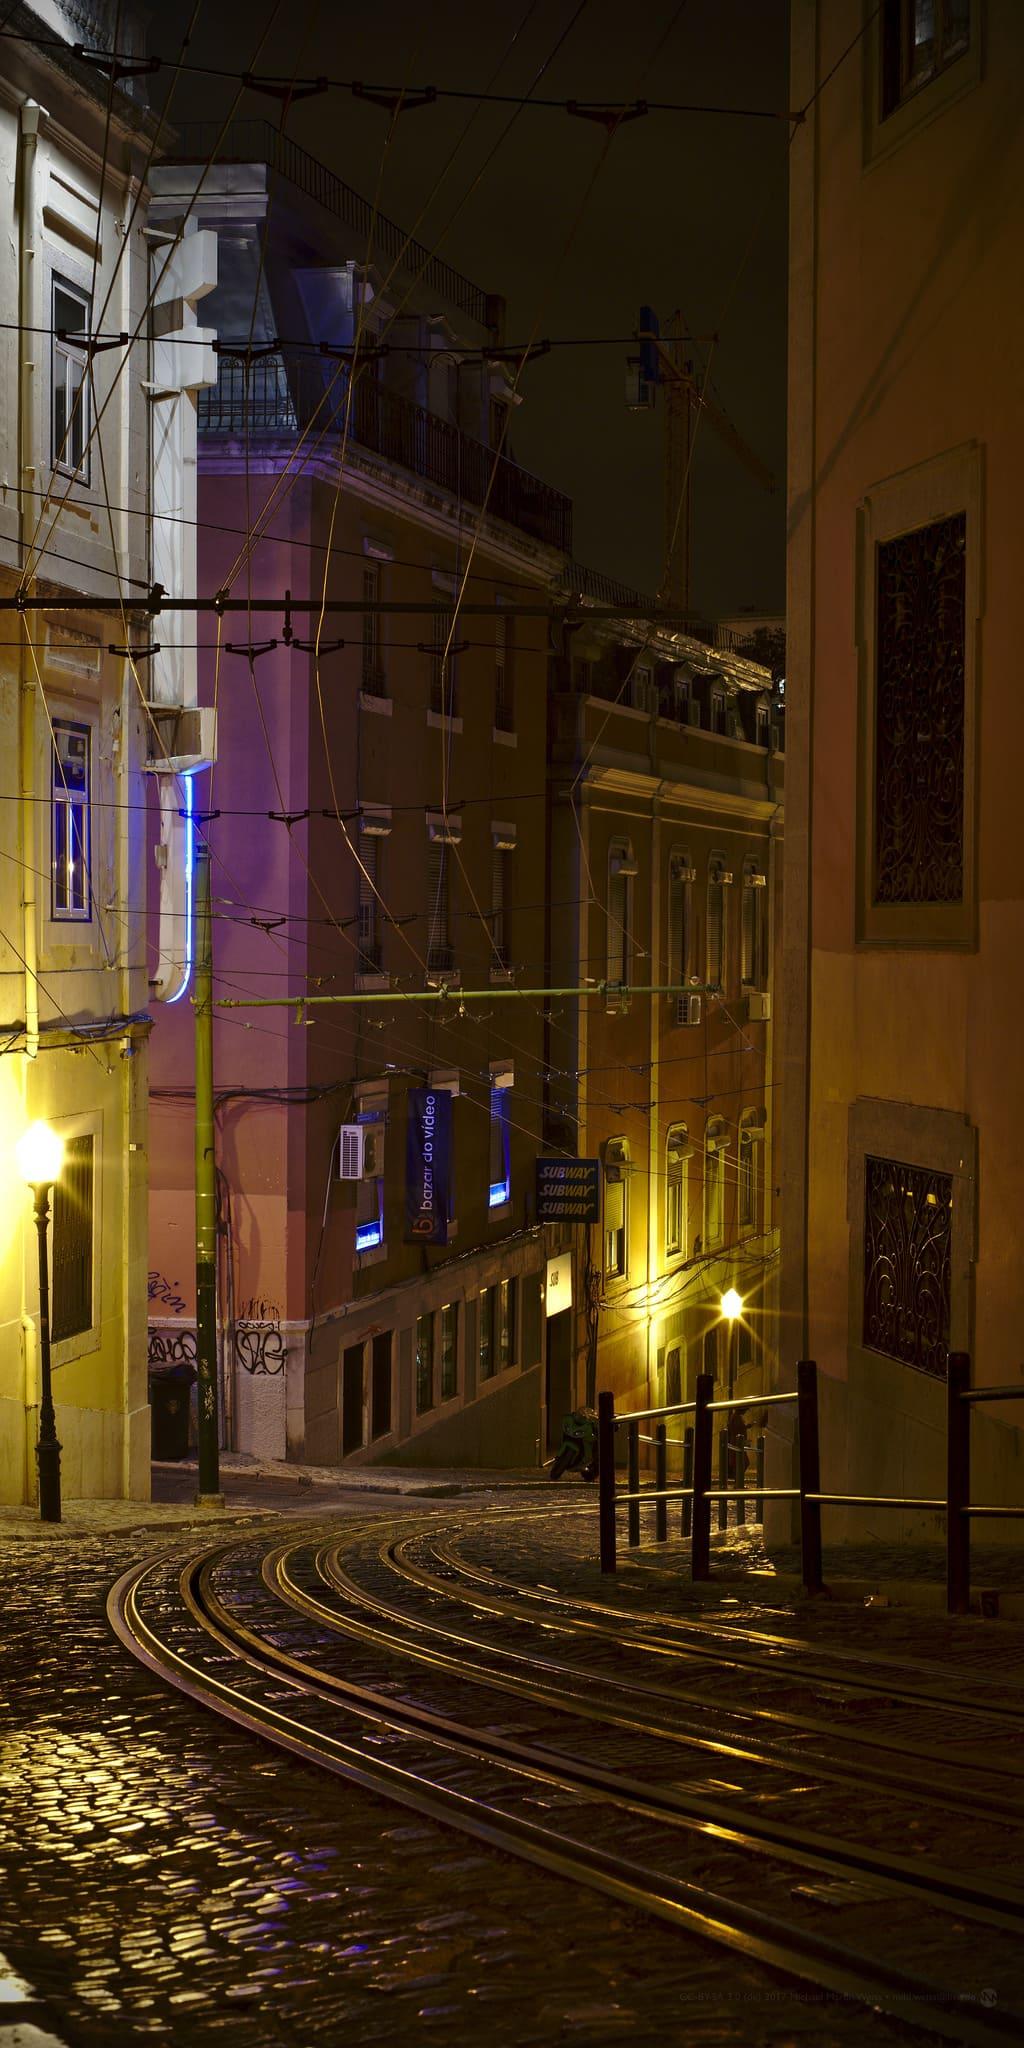 Lisbona tram tradizionale